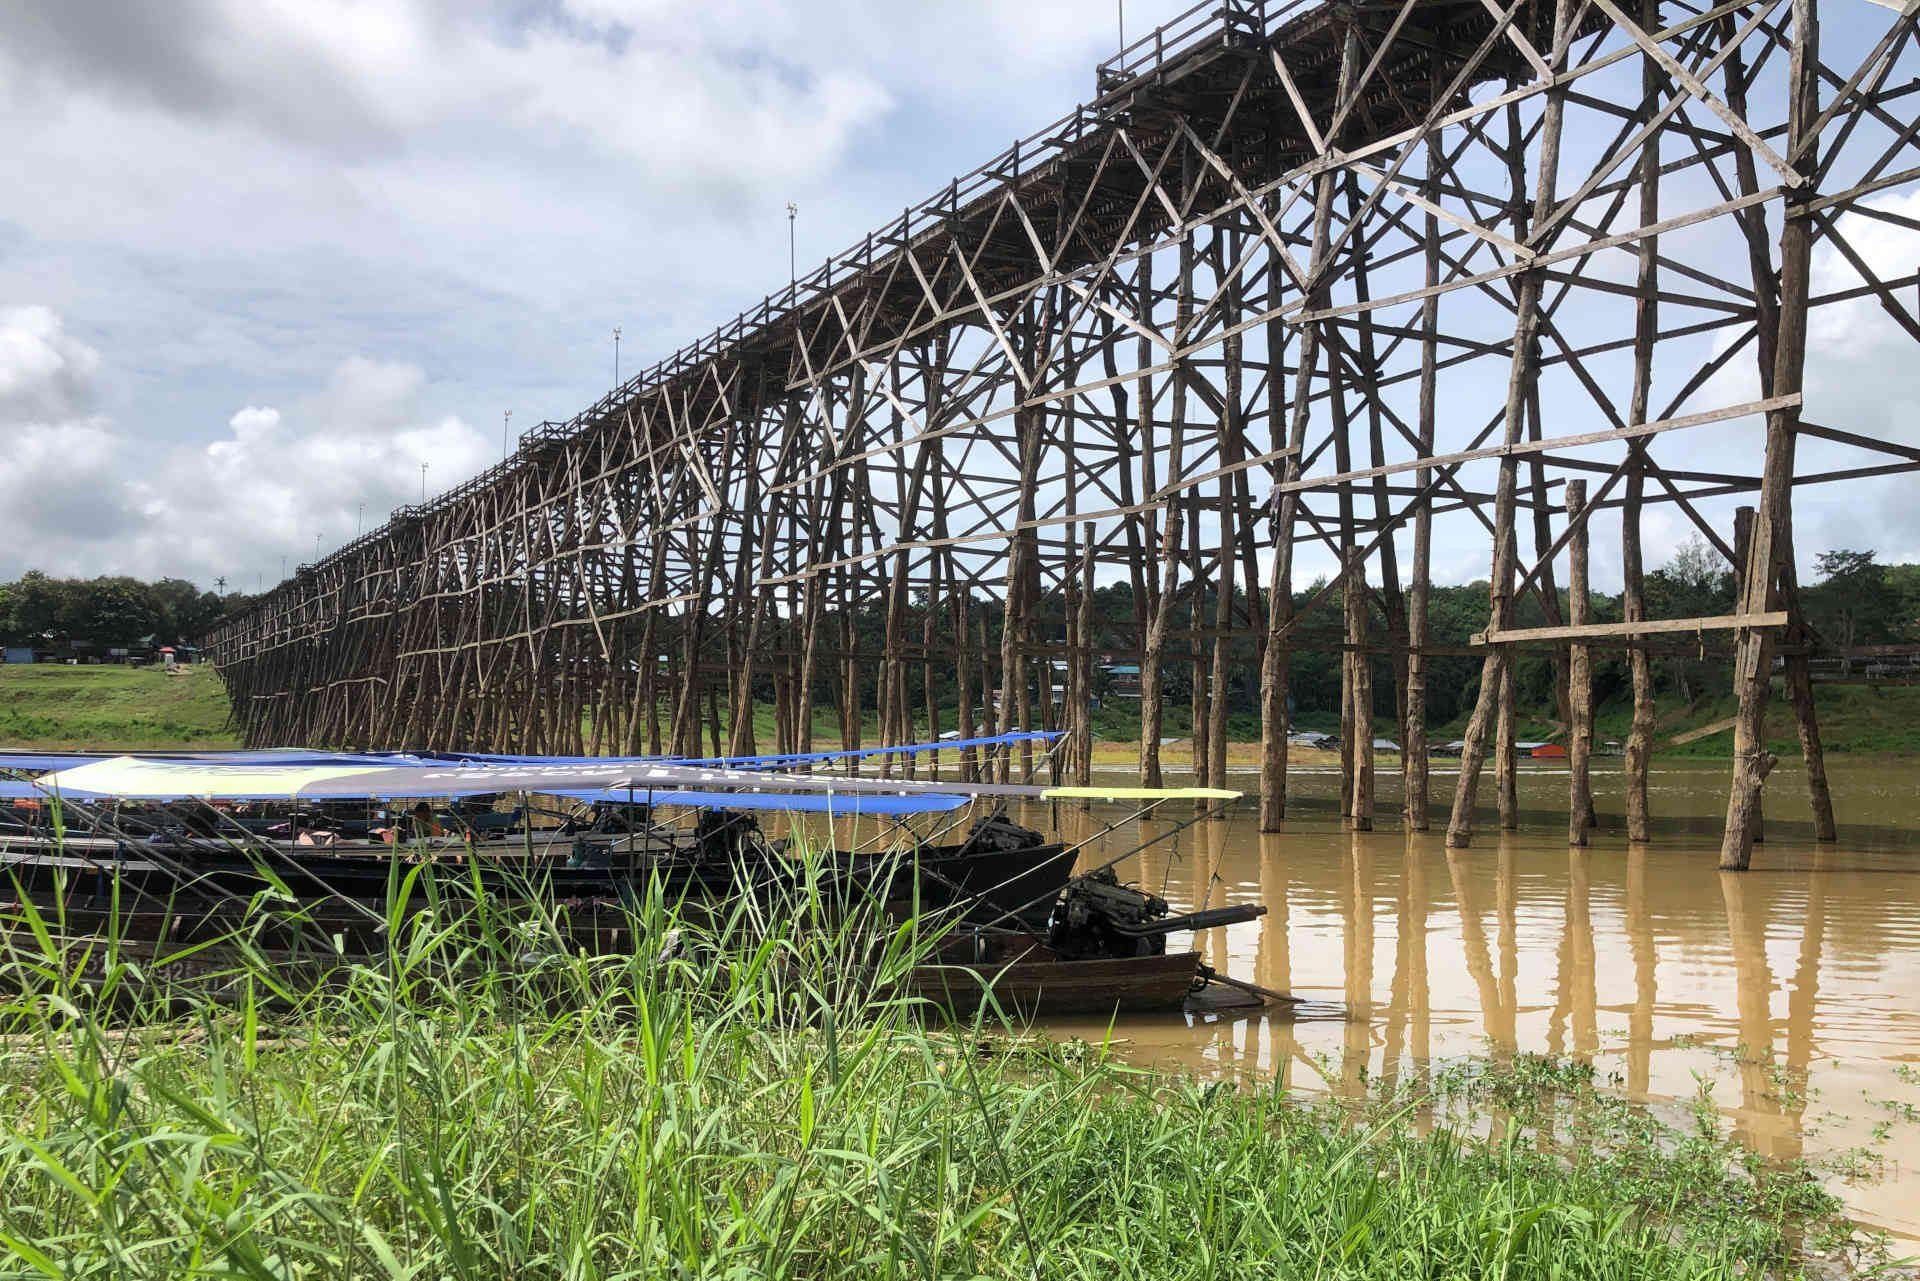 the Mon wooden bridge